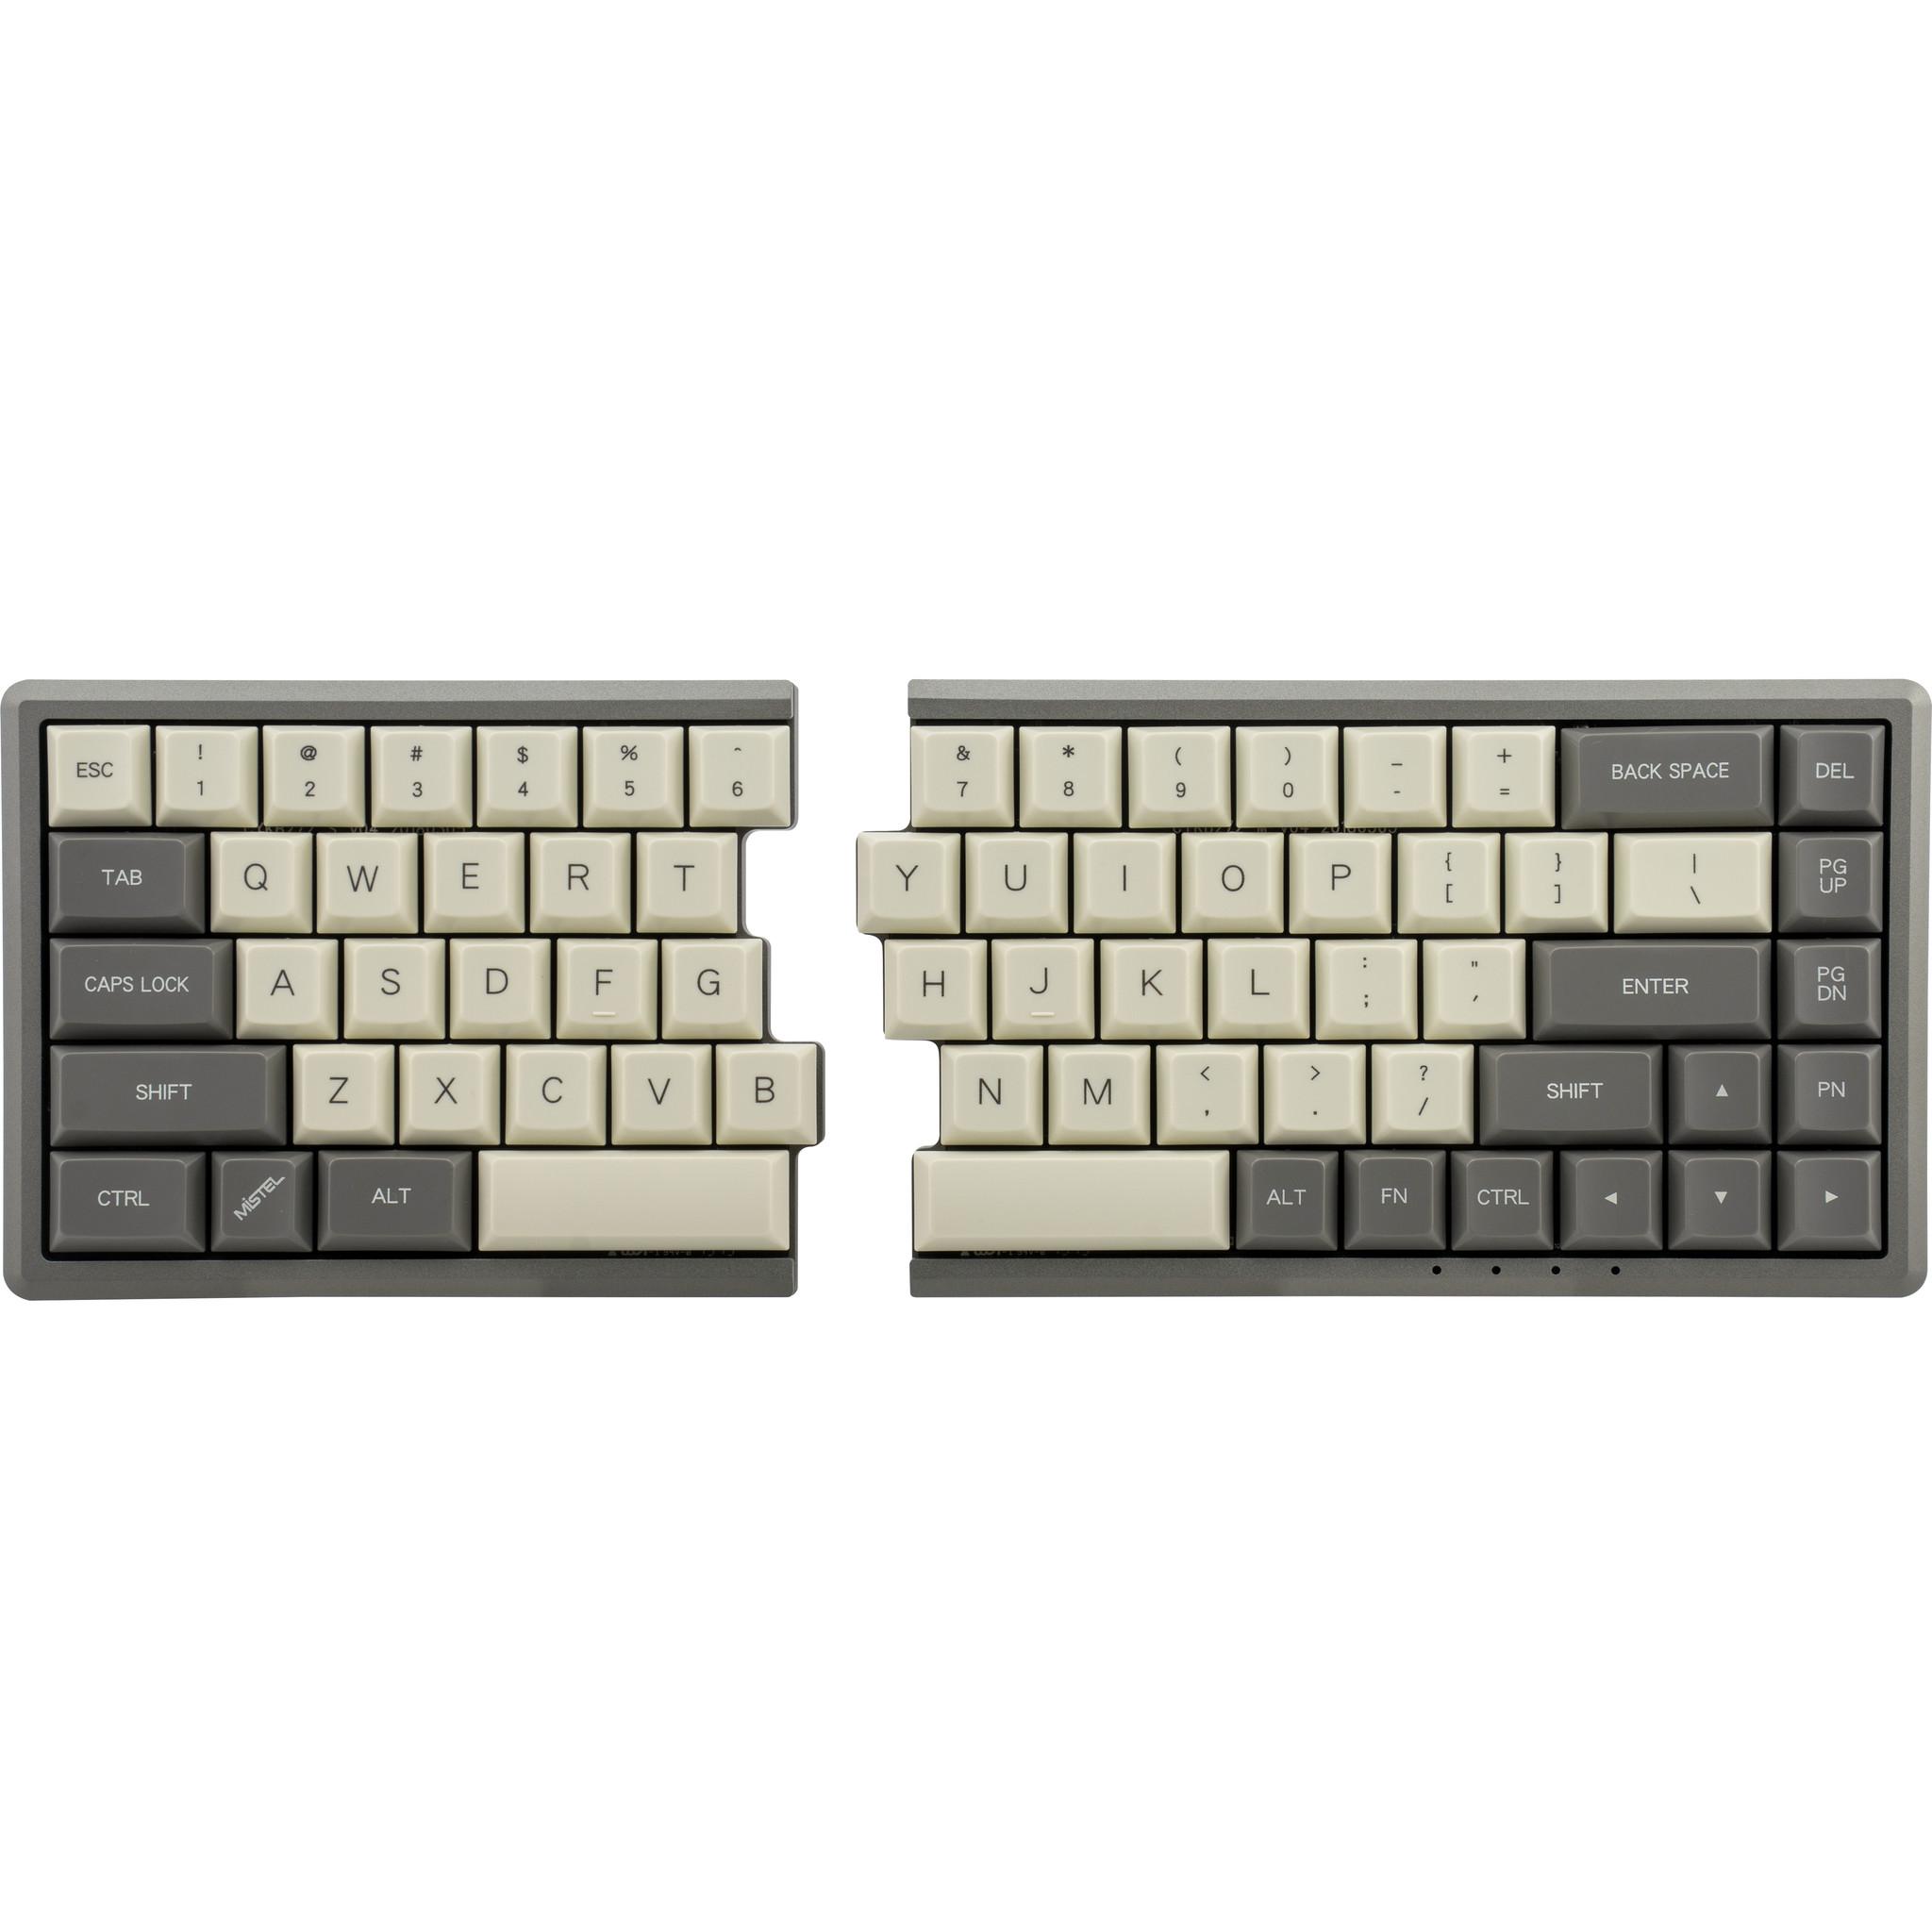 Mistel MD650L Barocco (Cherry ML) Low-Profile toetsenbord